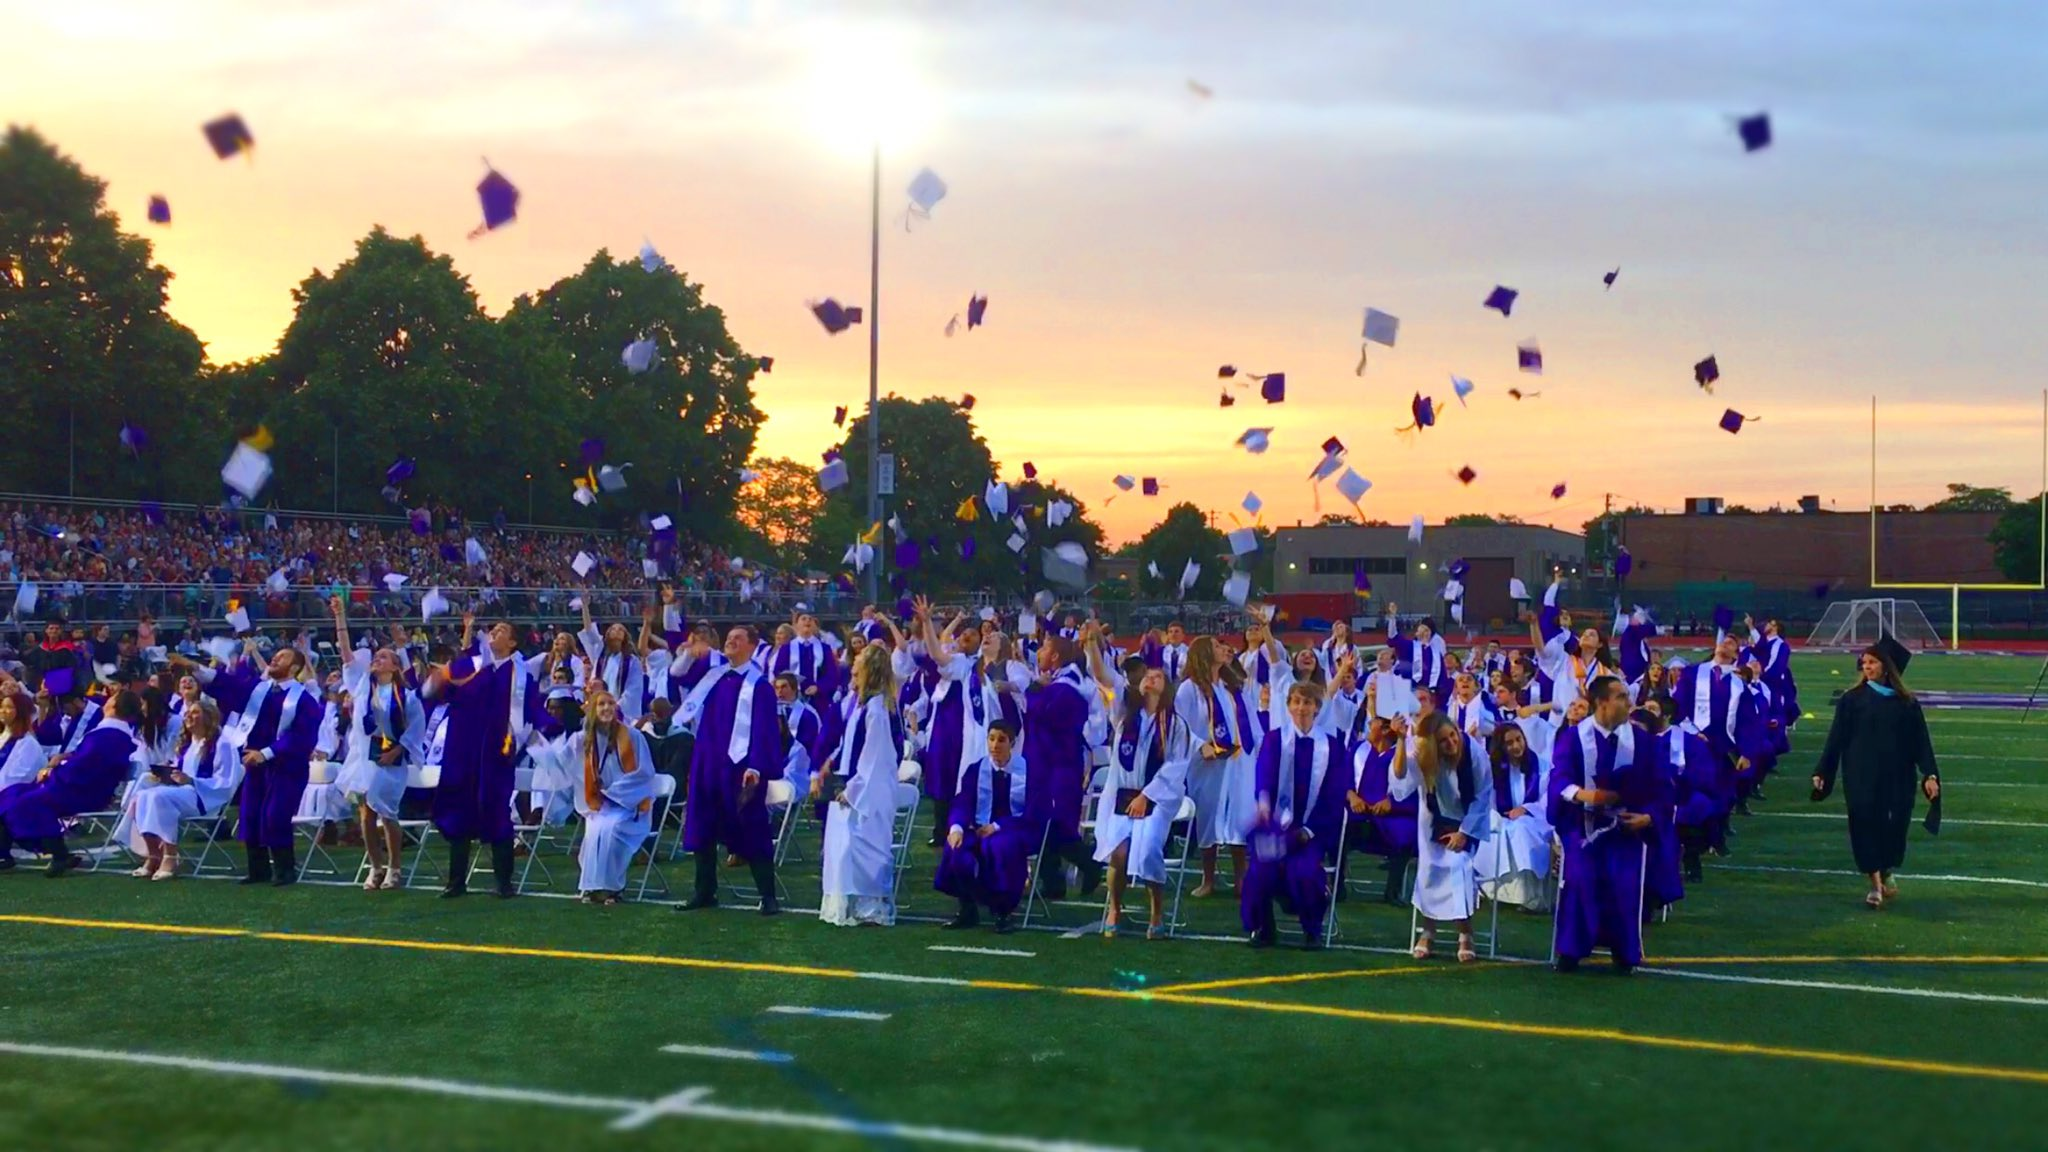 Congrats Class of 2016! #WeAreDGN #99Learns https://t.co/GG4bUpHyYJ